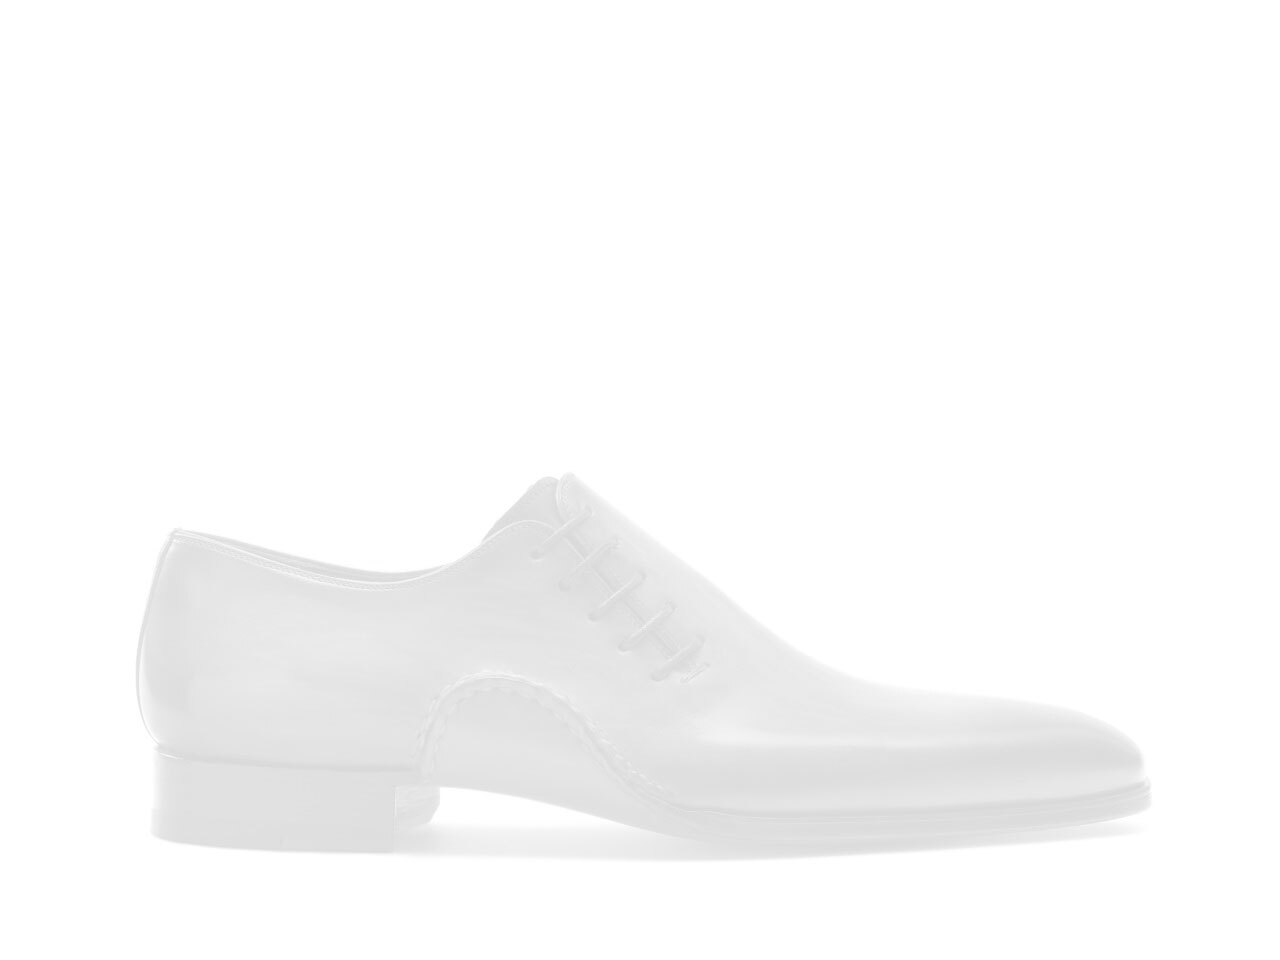 Sole of the Magnanni Jude Cognac Men's Oxford Shoes